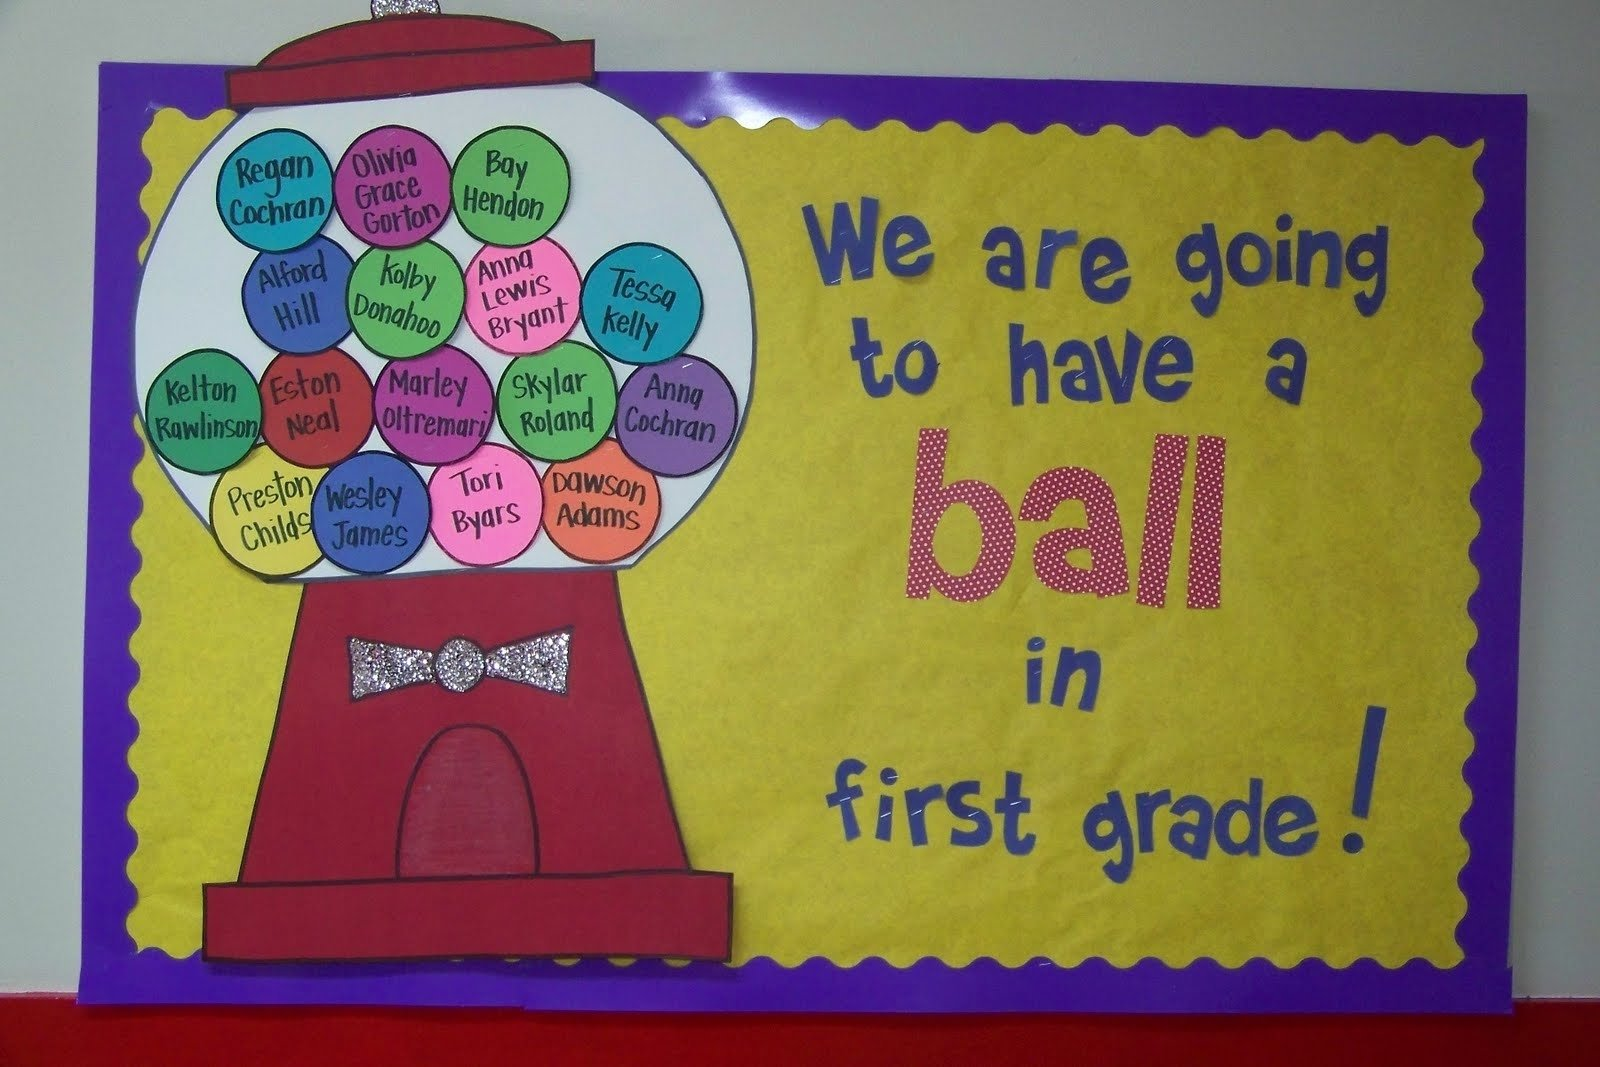 10 Elegant Bulletin Board Ideas For Back To School doodle bugs teaching first grade rocks bubble gum back to school 1 2021